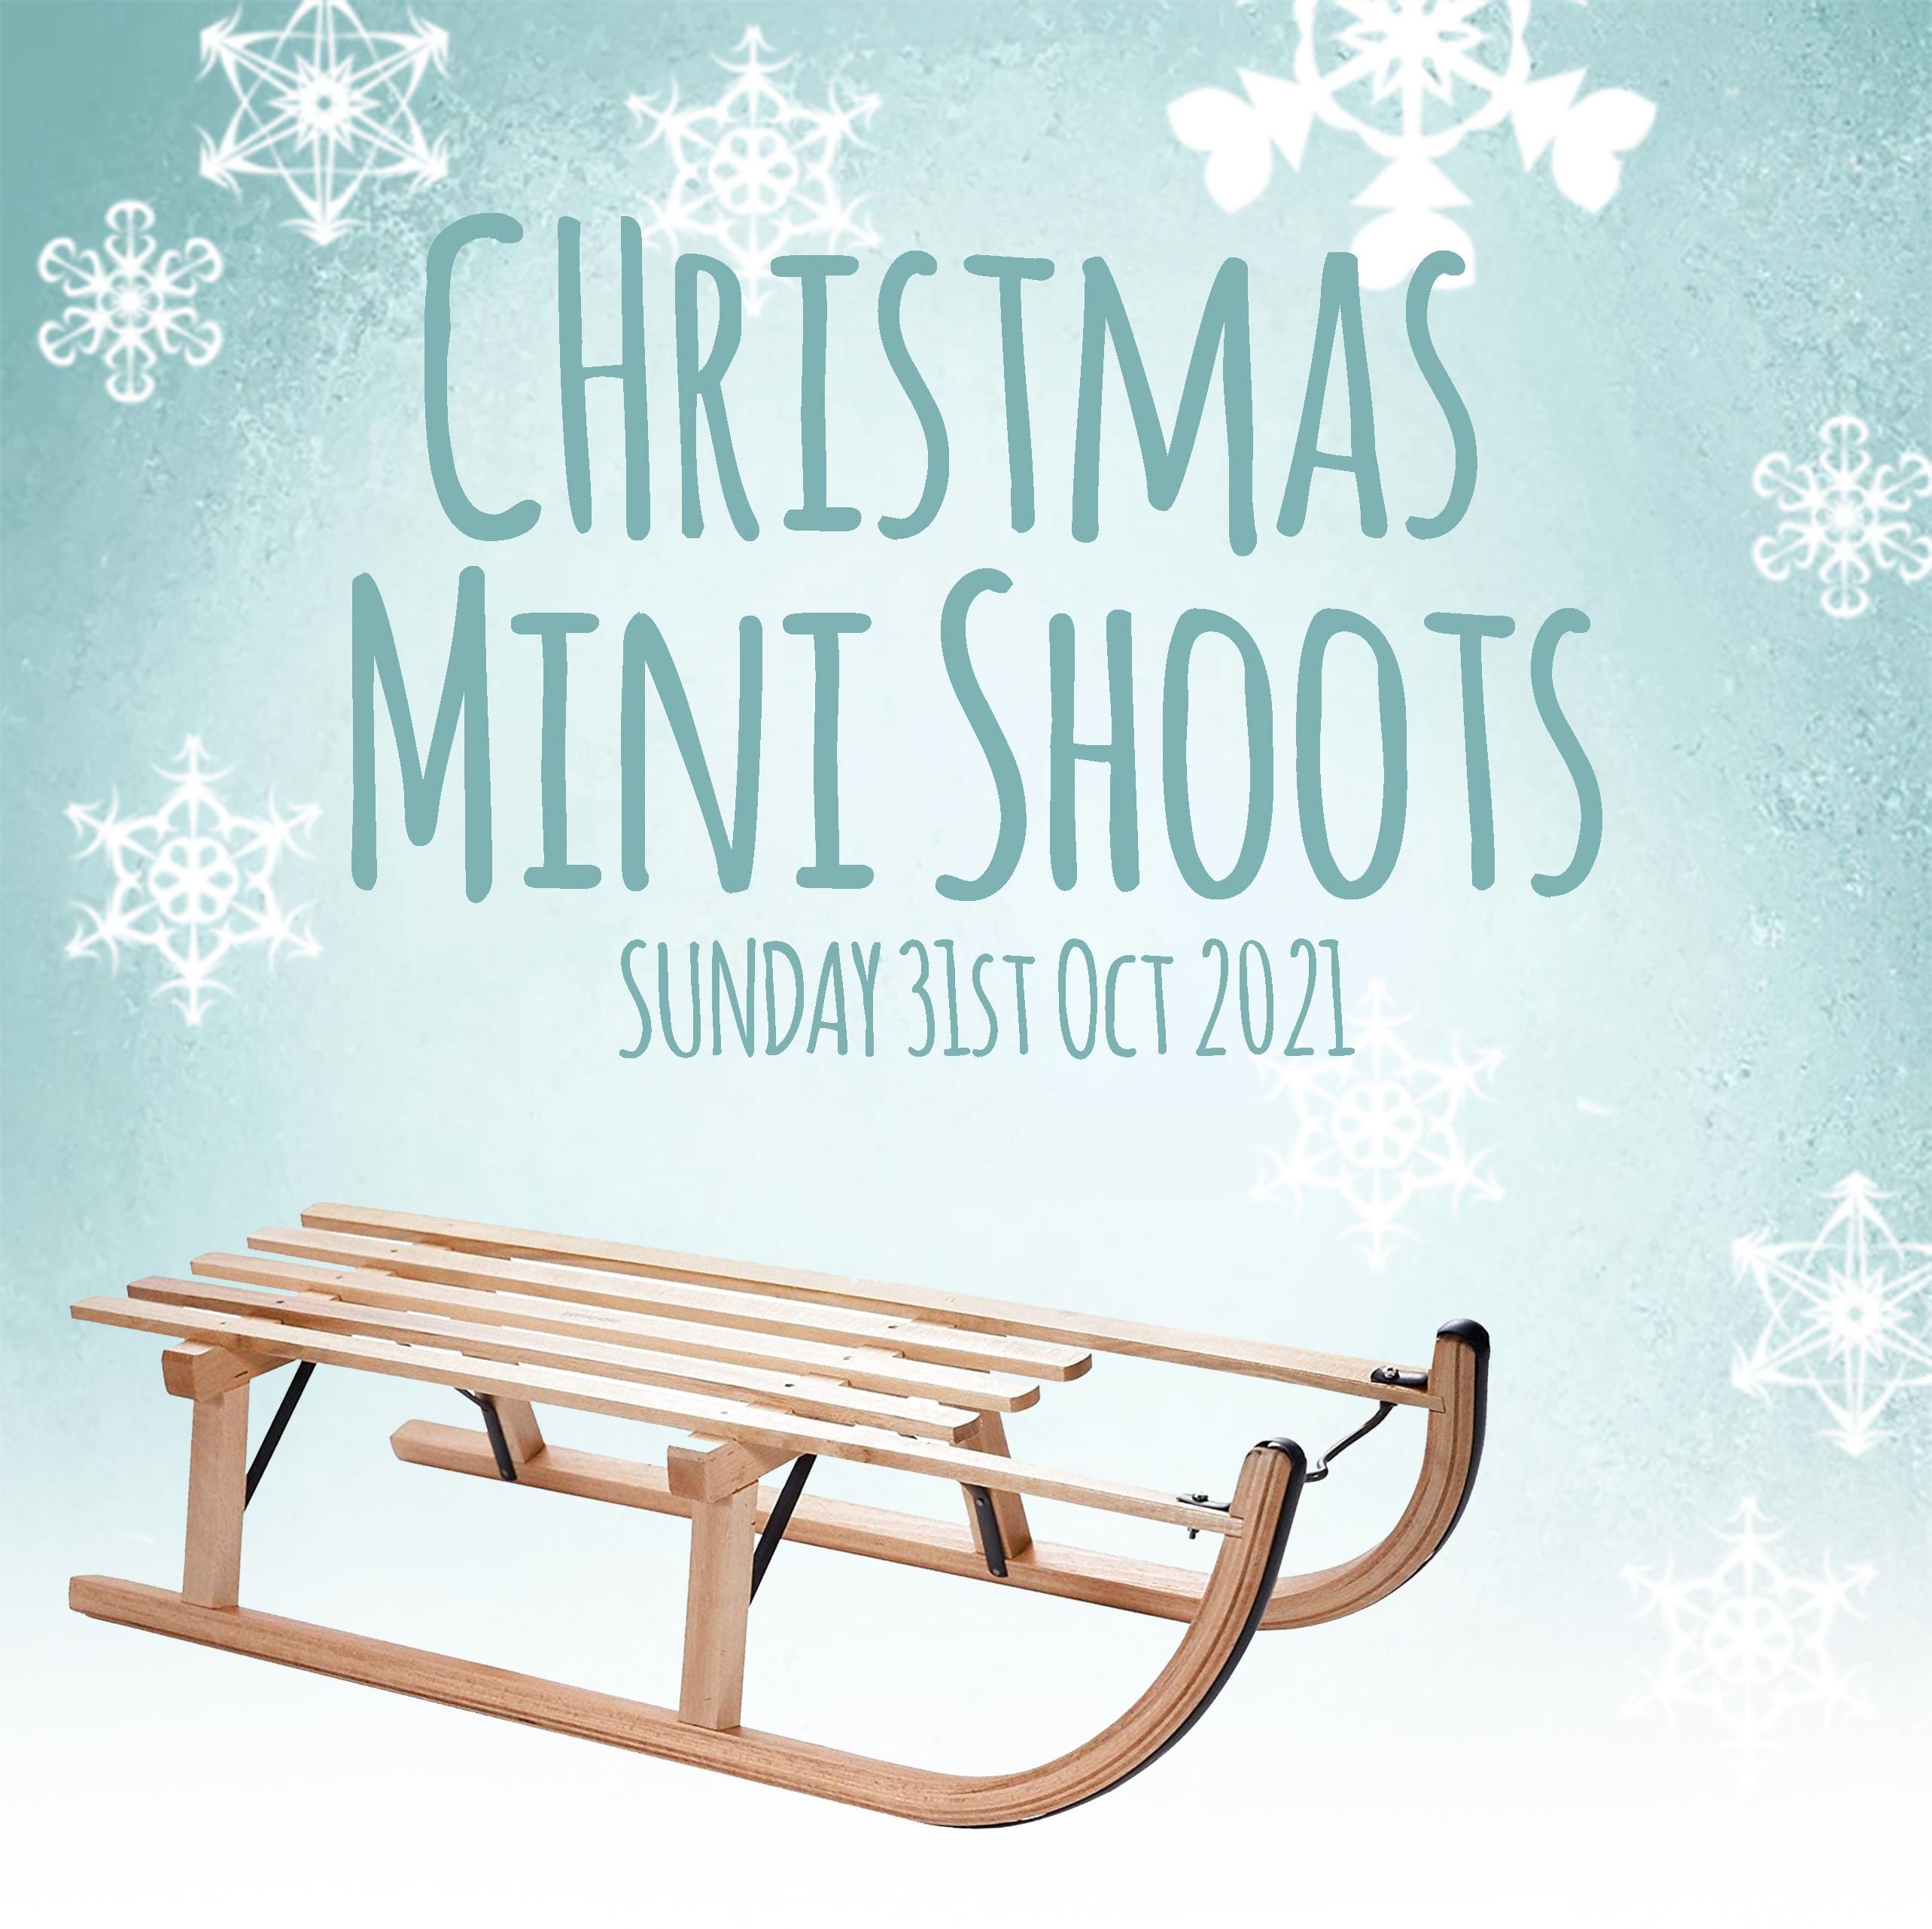 Christmas Minis Sunday 31st Oct 2021